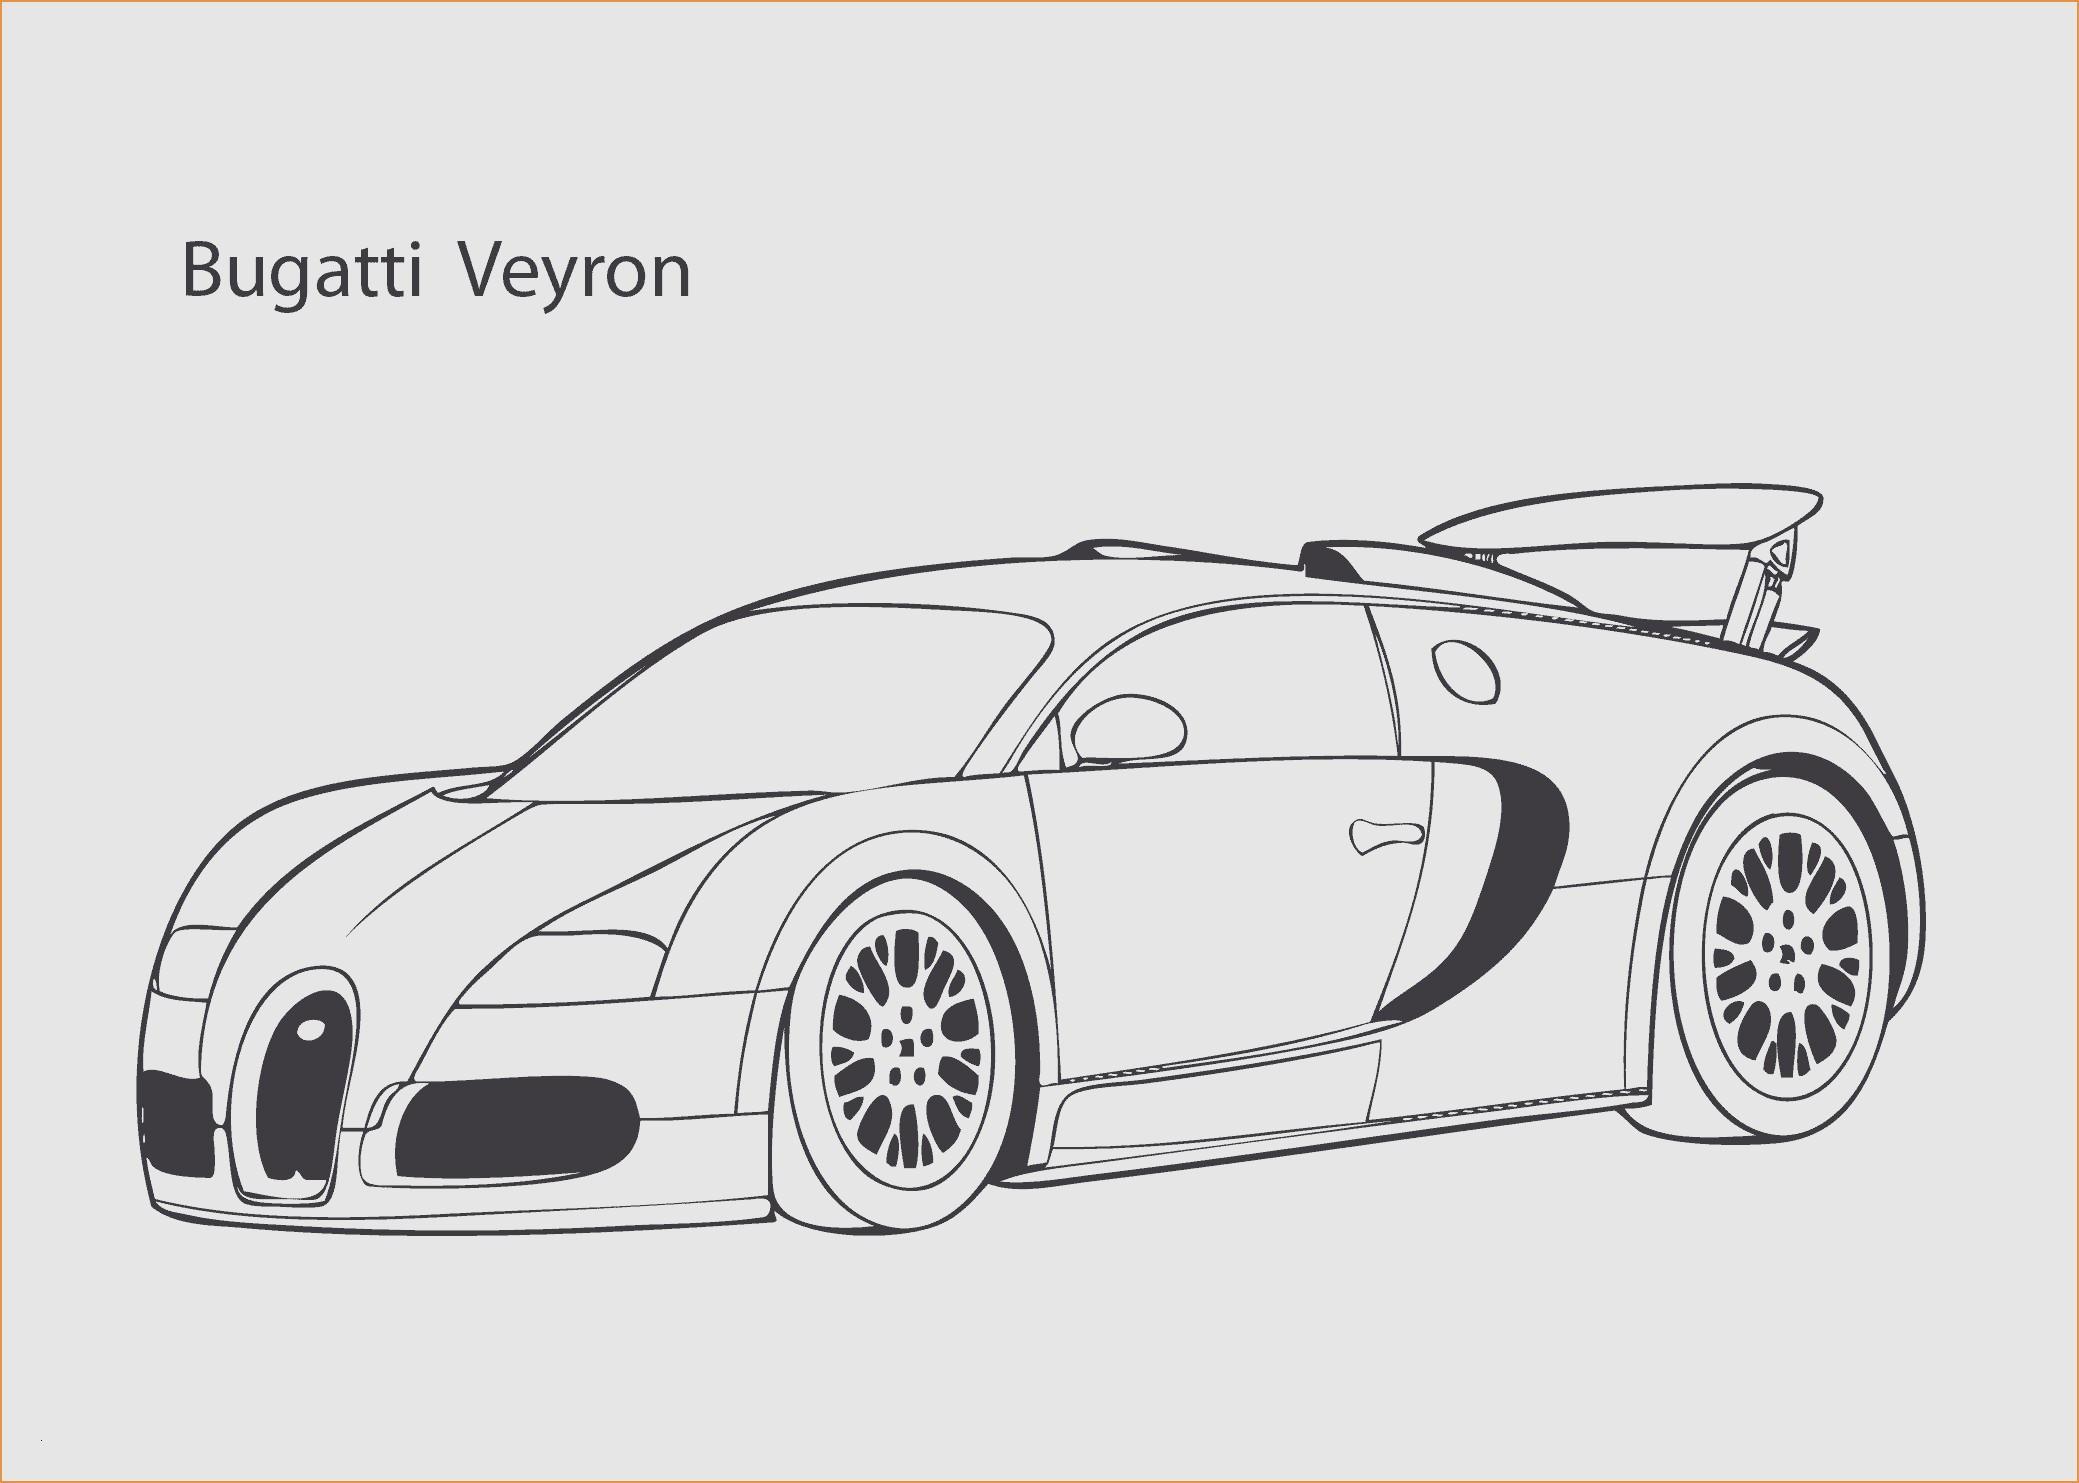 Ausmalbilder Autos Lamborghini Inspirierend Auto Ausmalbilder Porsche Frisch 13 astonishing Bugatti Sedan Fotografieren